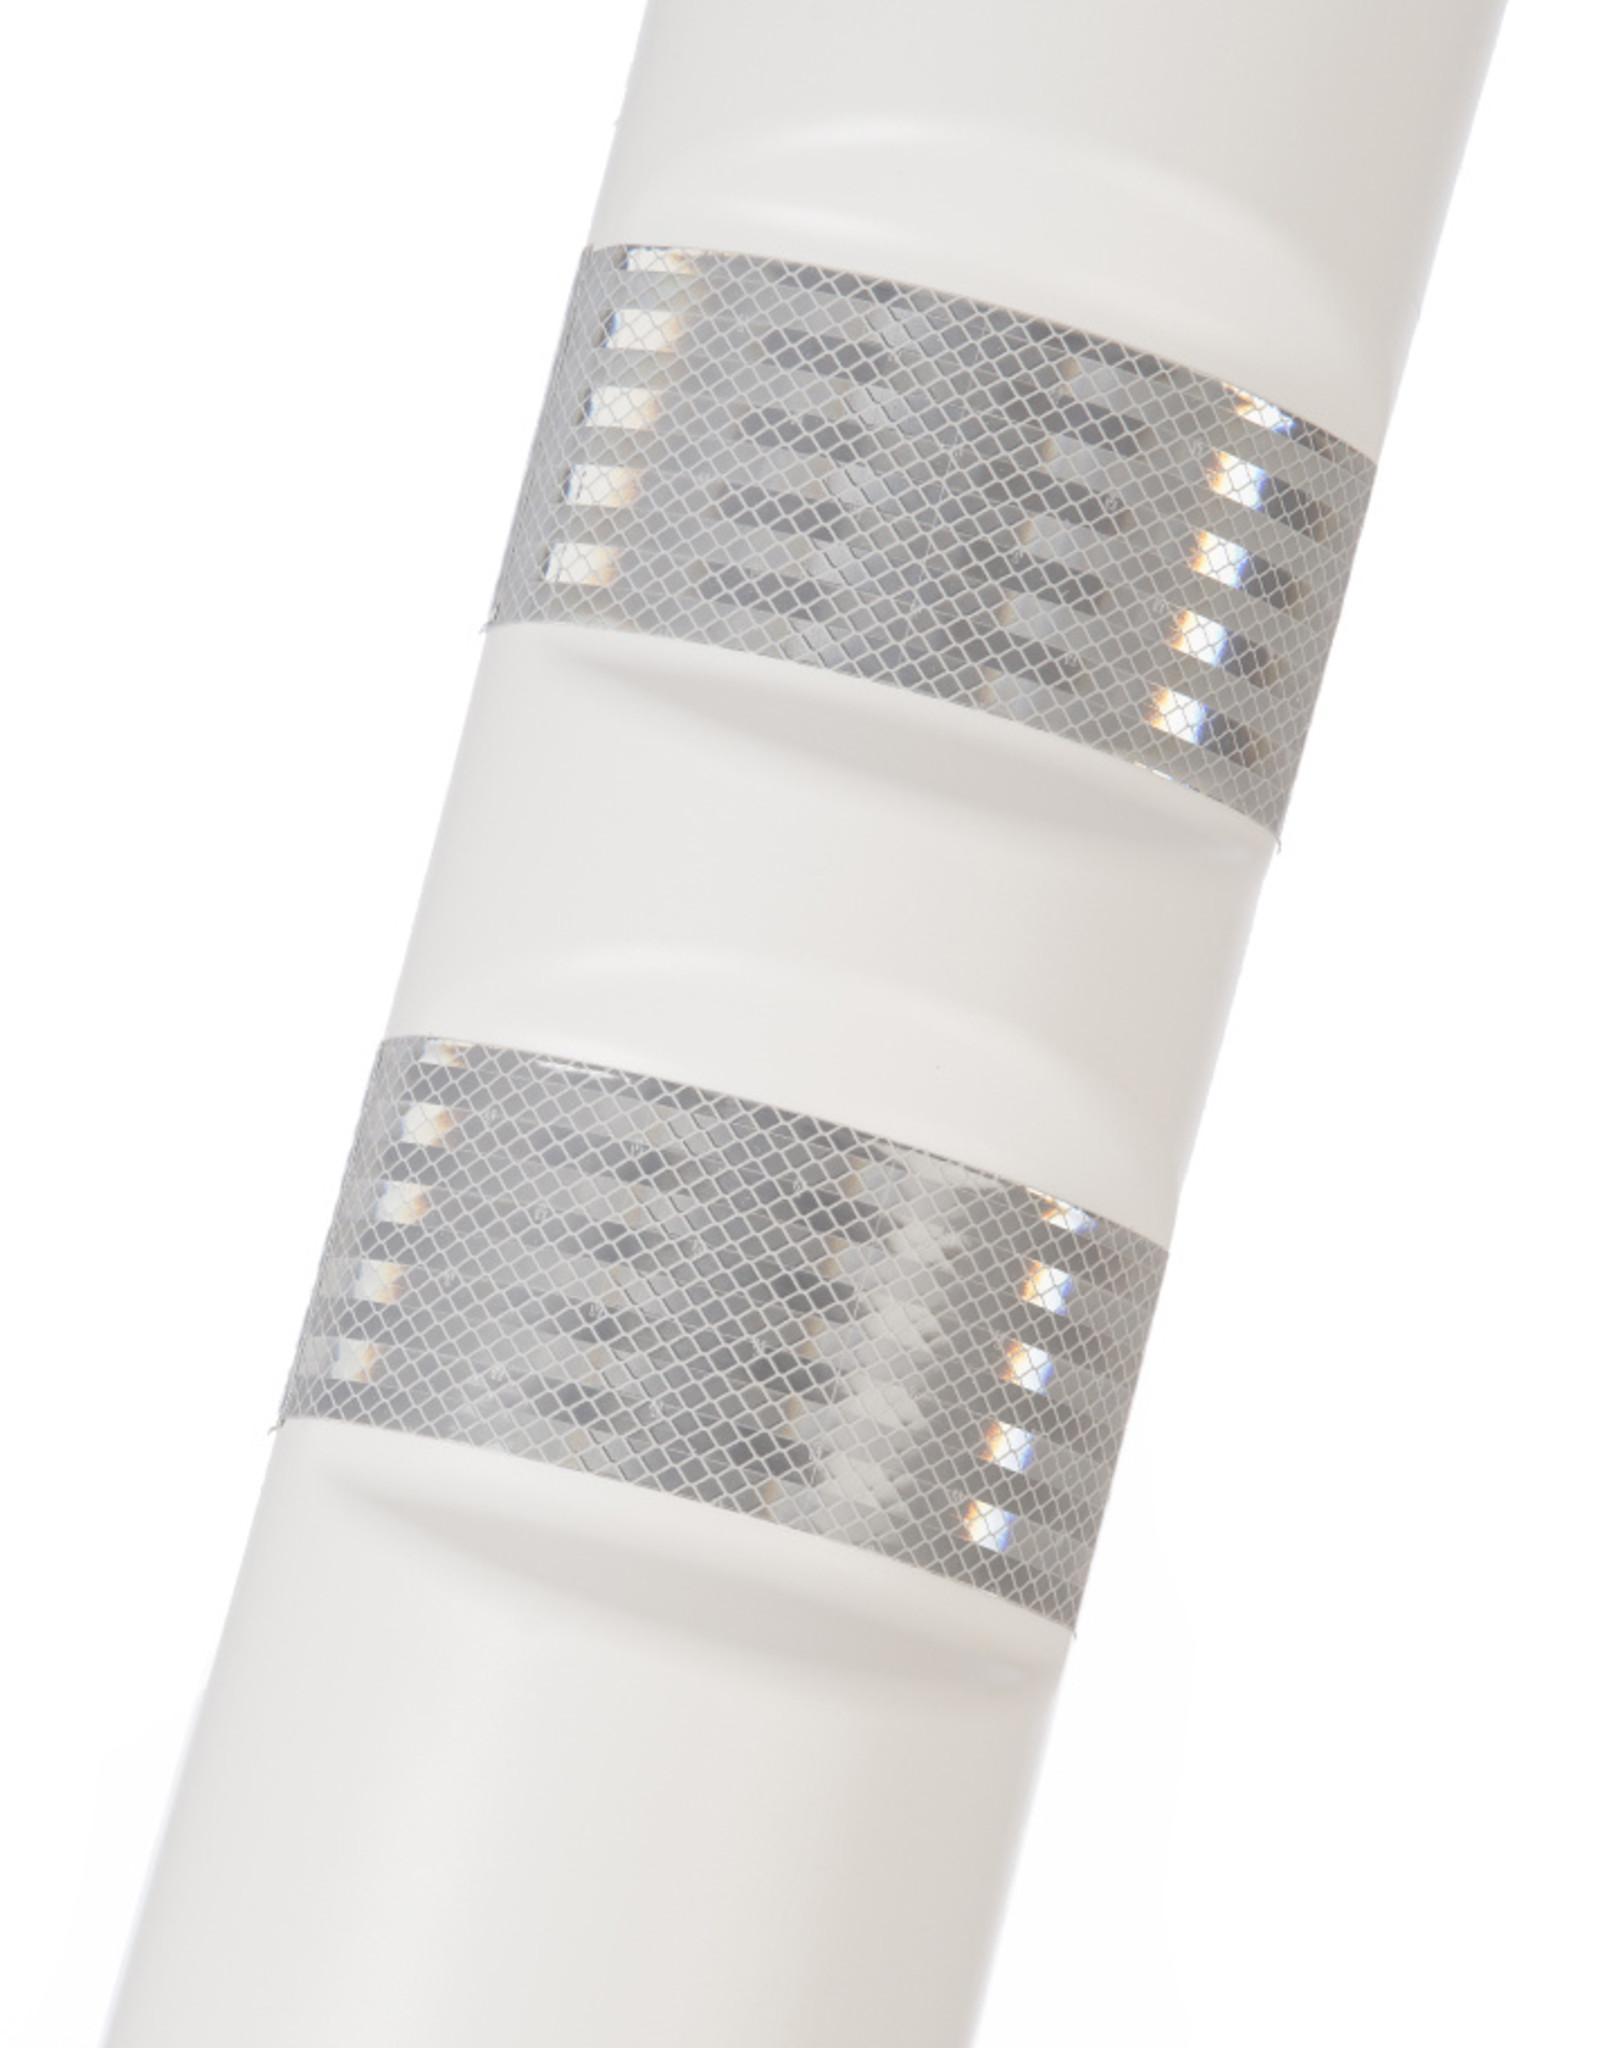 Ri-Traffic   Kunststof Plooibakens Wit 75 cm met Retroreflecterie